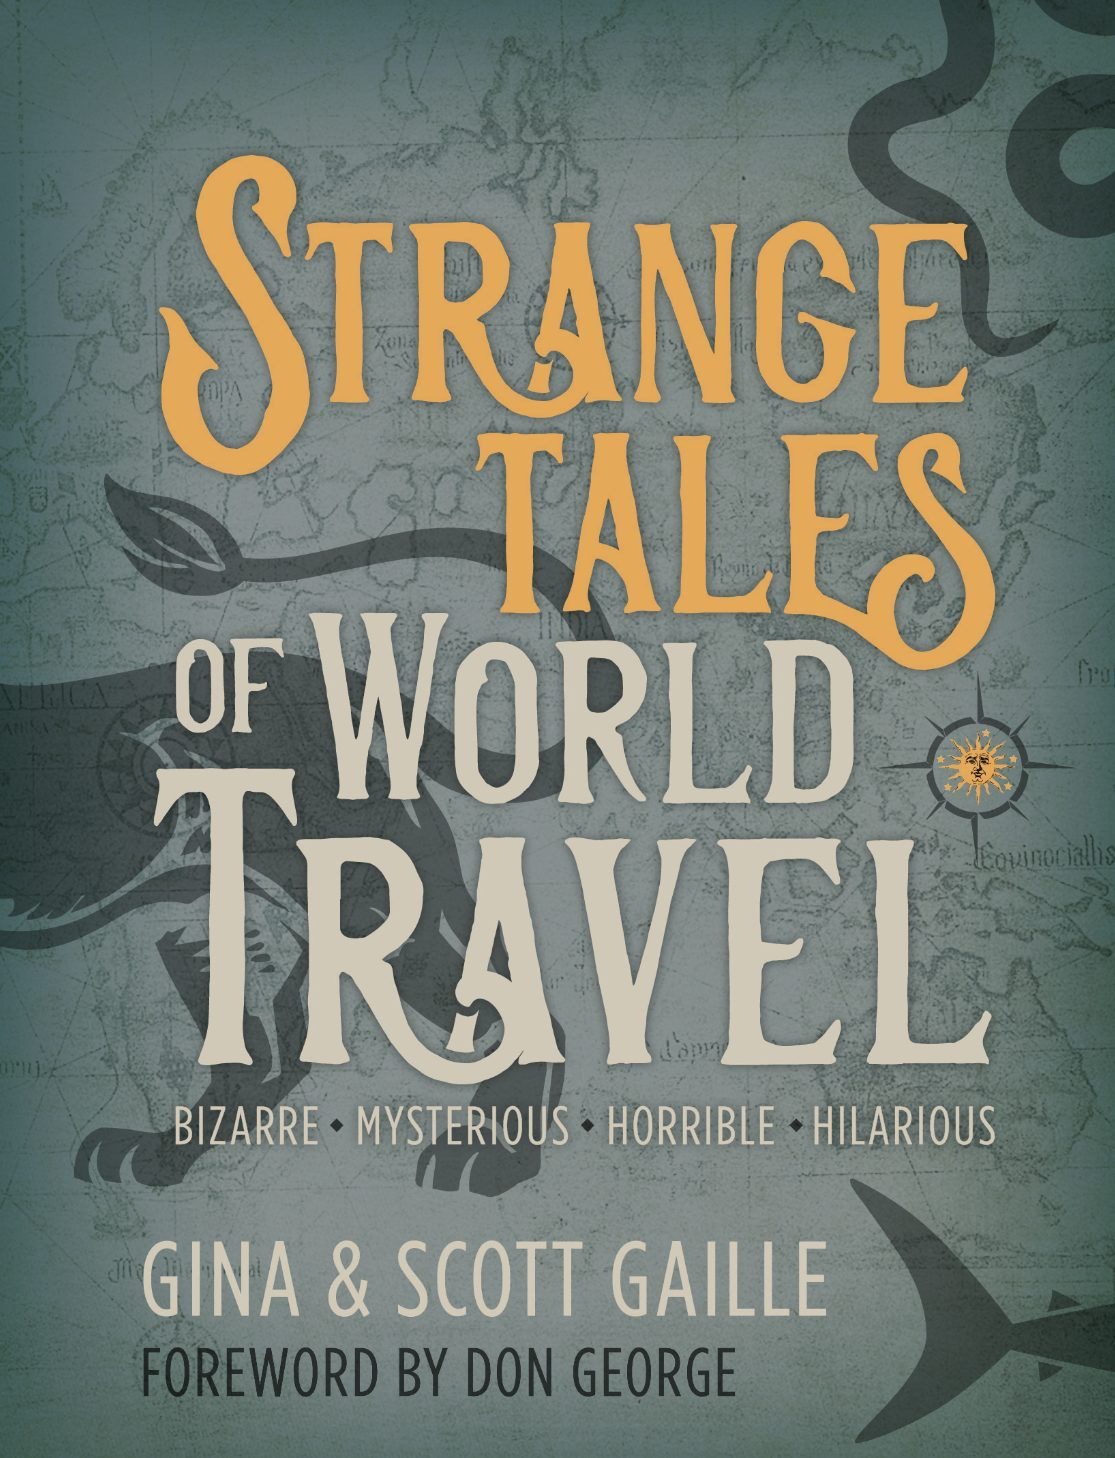 Strangest Travel